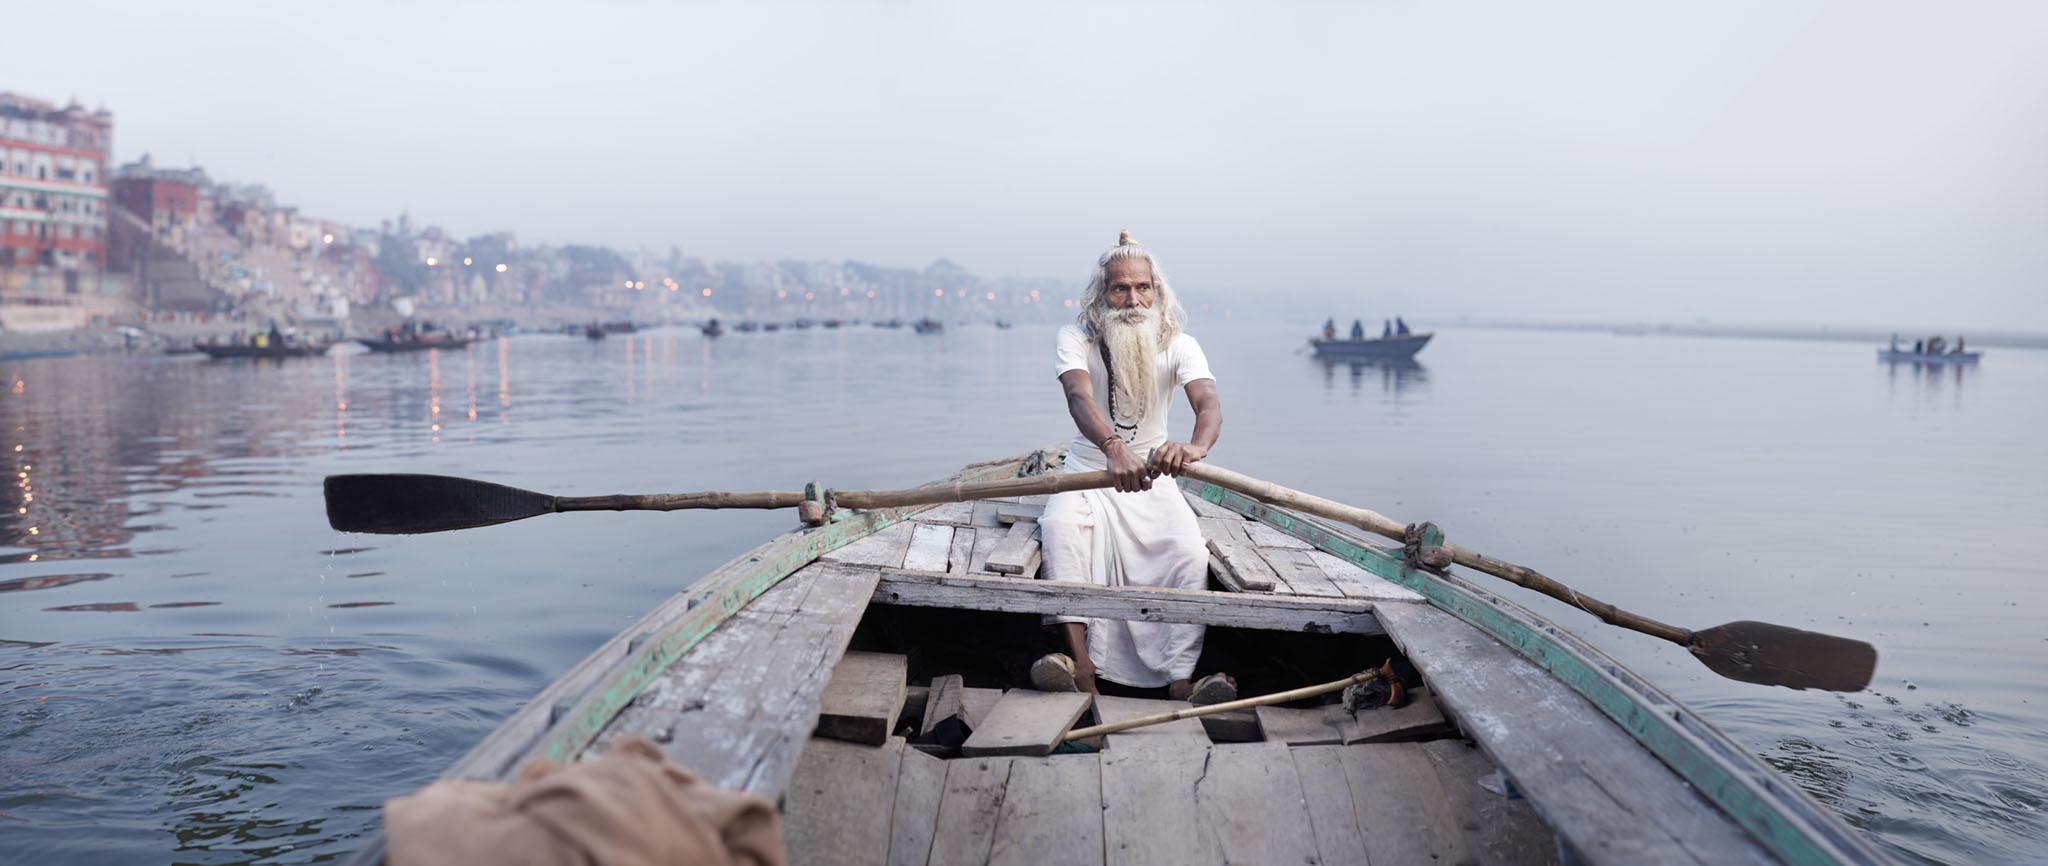 1 Varanasi India Site Beqbe